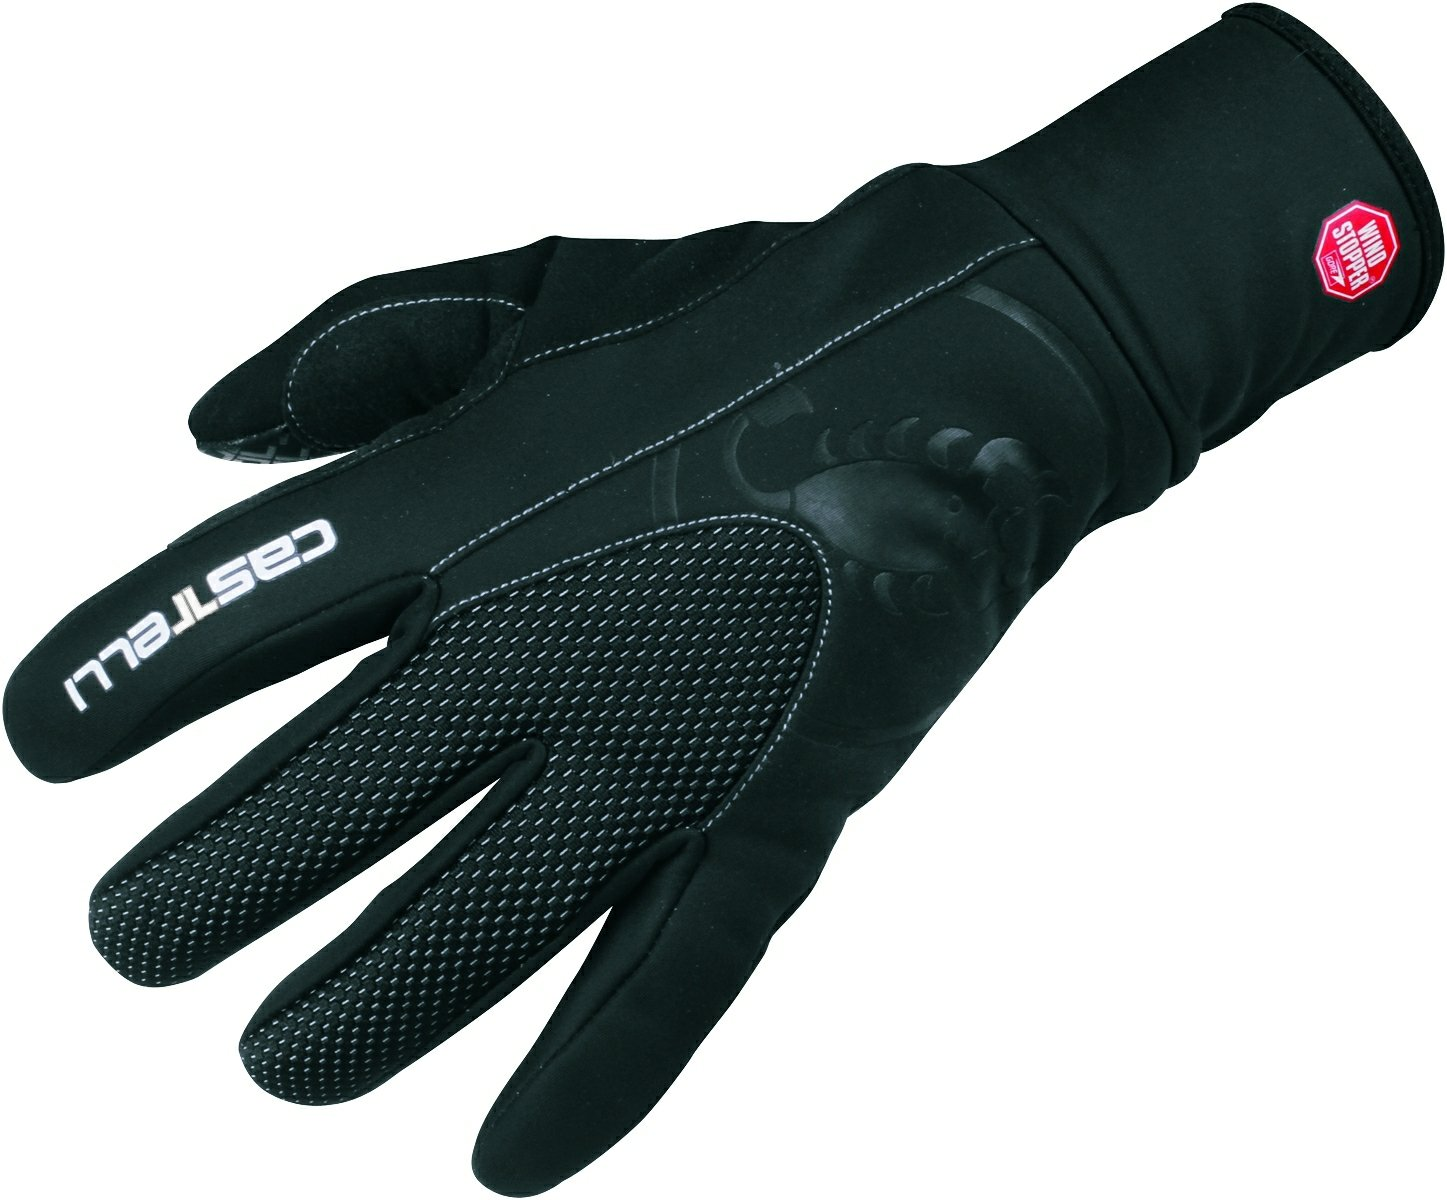 Castelli Estremo Gloves Black, XL - Men's by Castelli